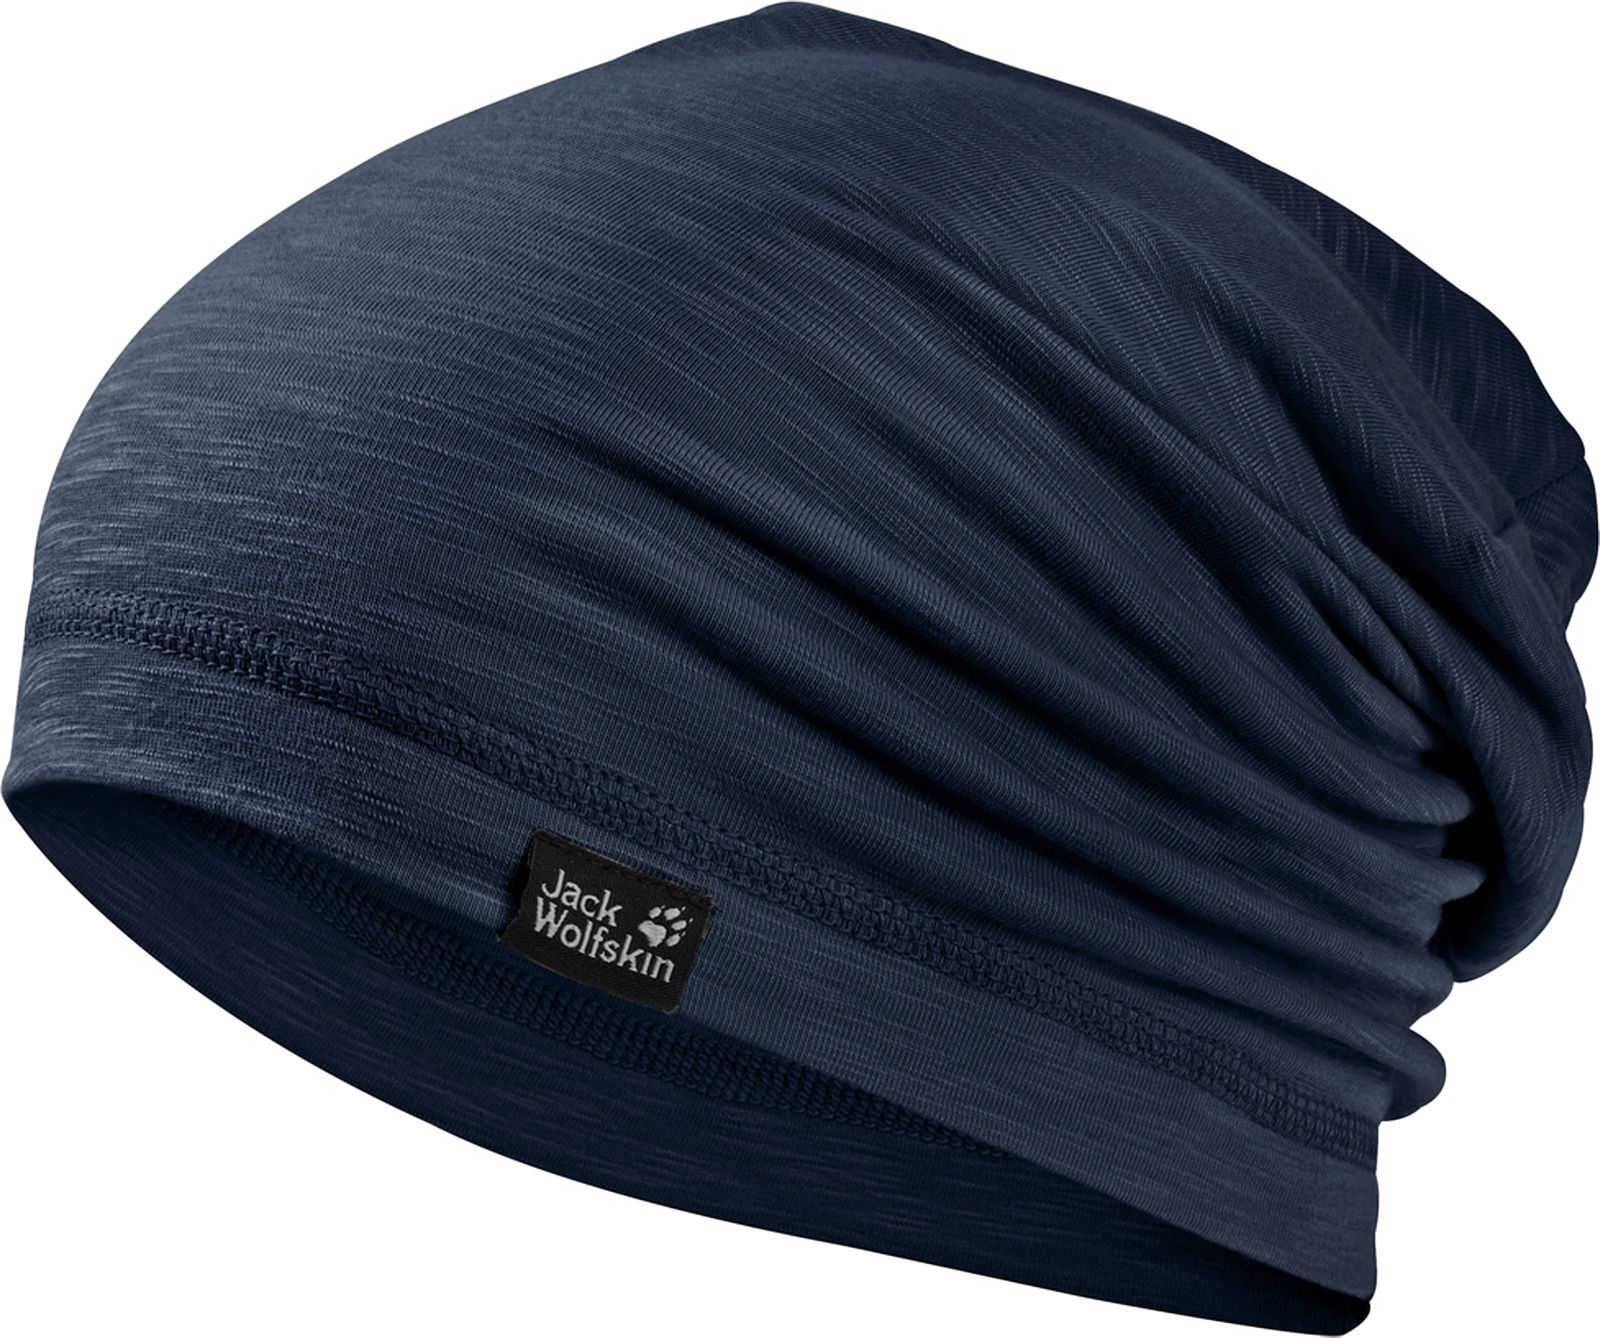 Шапка Jack Wolfskin Travel Beanie, цвет: темно-синий. 1905601-1010. Размер 55/59